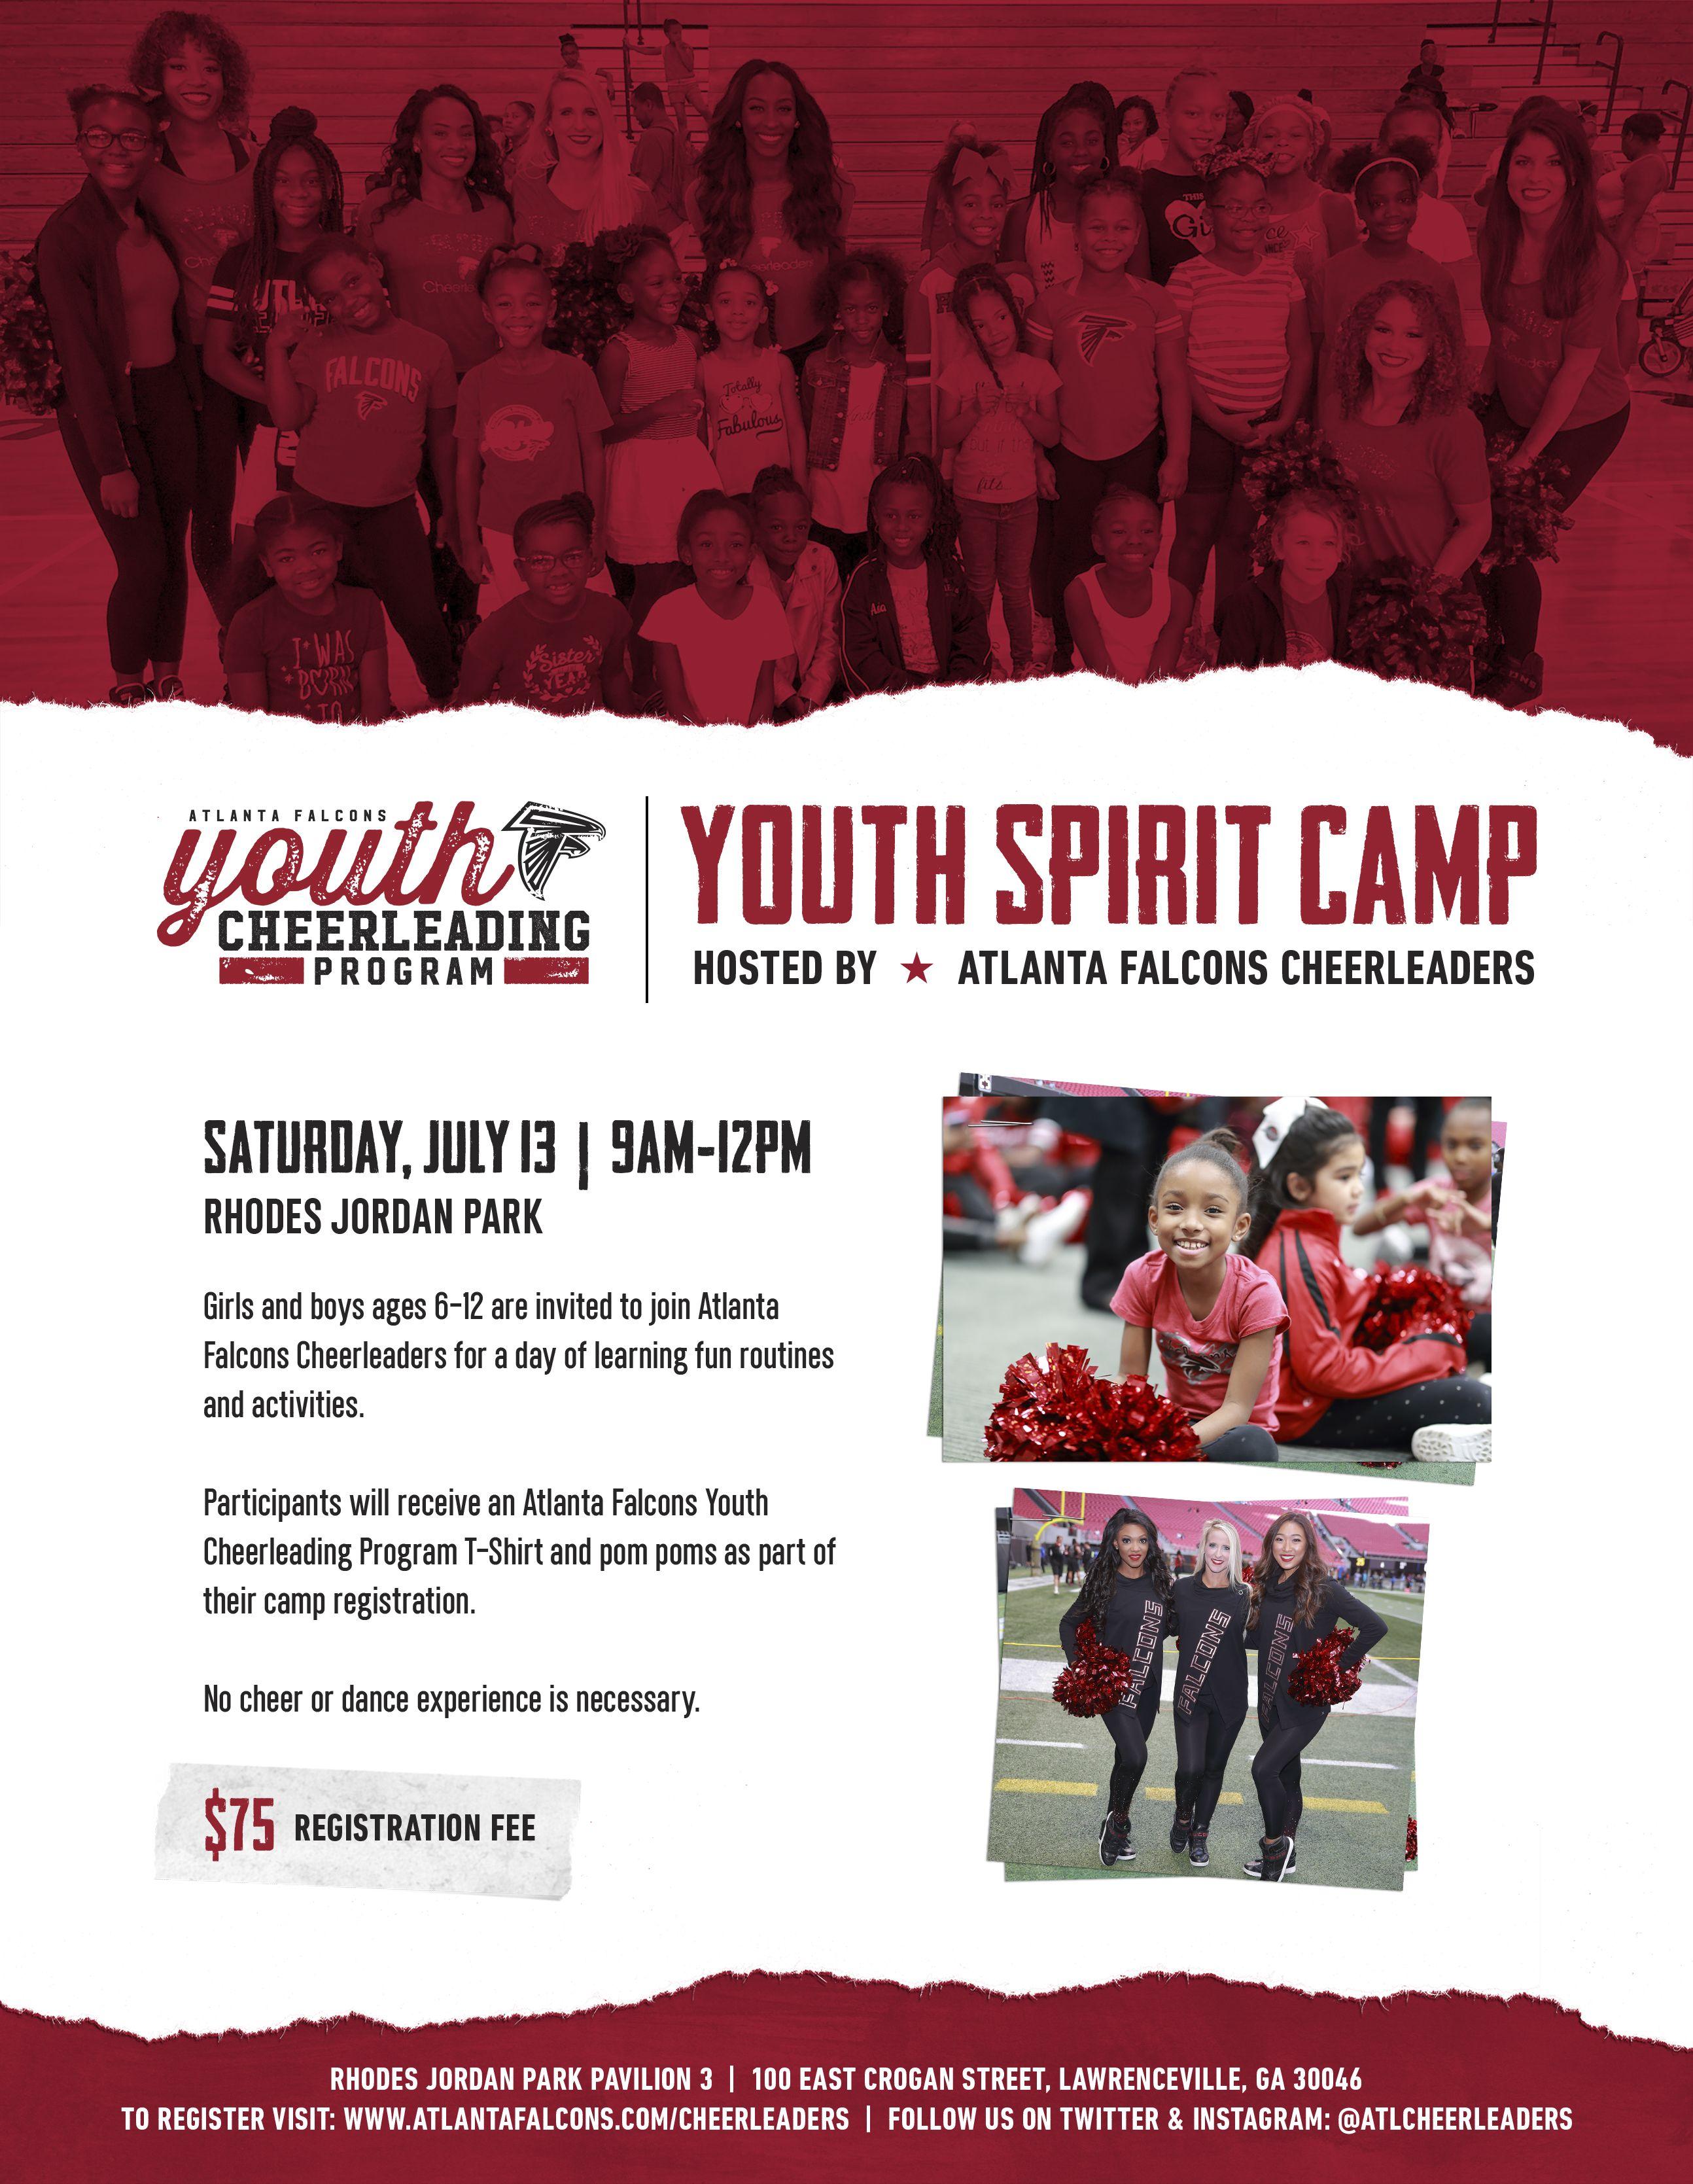 Youth Spirit Camp